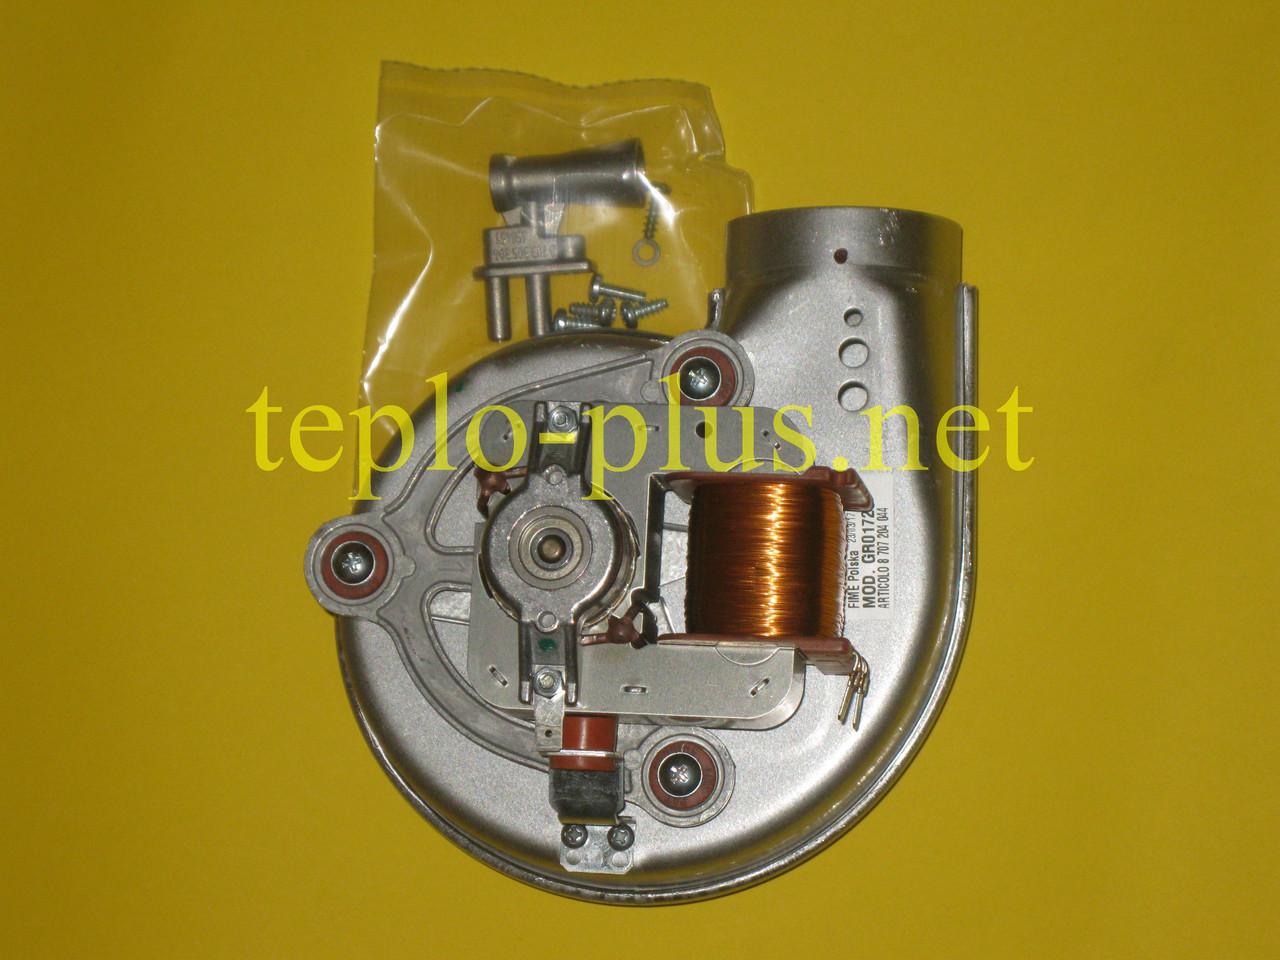 Вентилятор 8707204038 Junkers, Bosch Euroline ZW23-1AE, ZS23-1AE, Ceraclass ZW24-2DH AE, ZS24-2DH AE